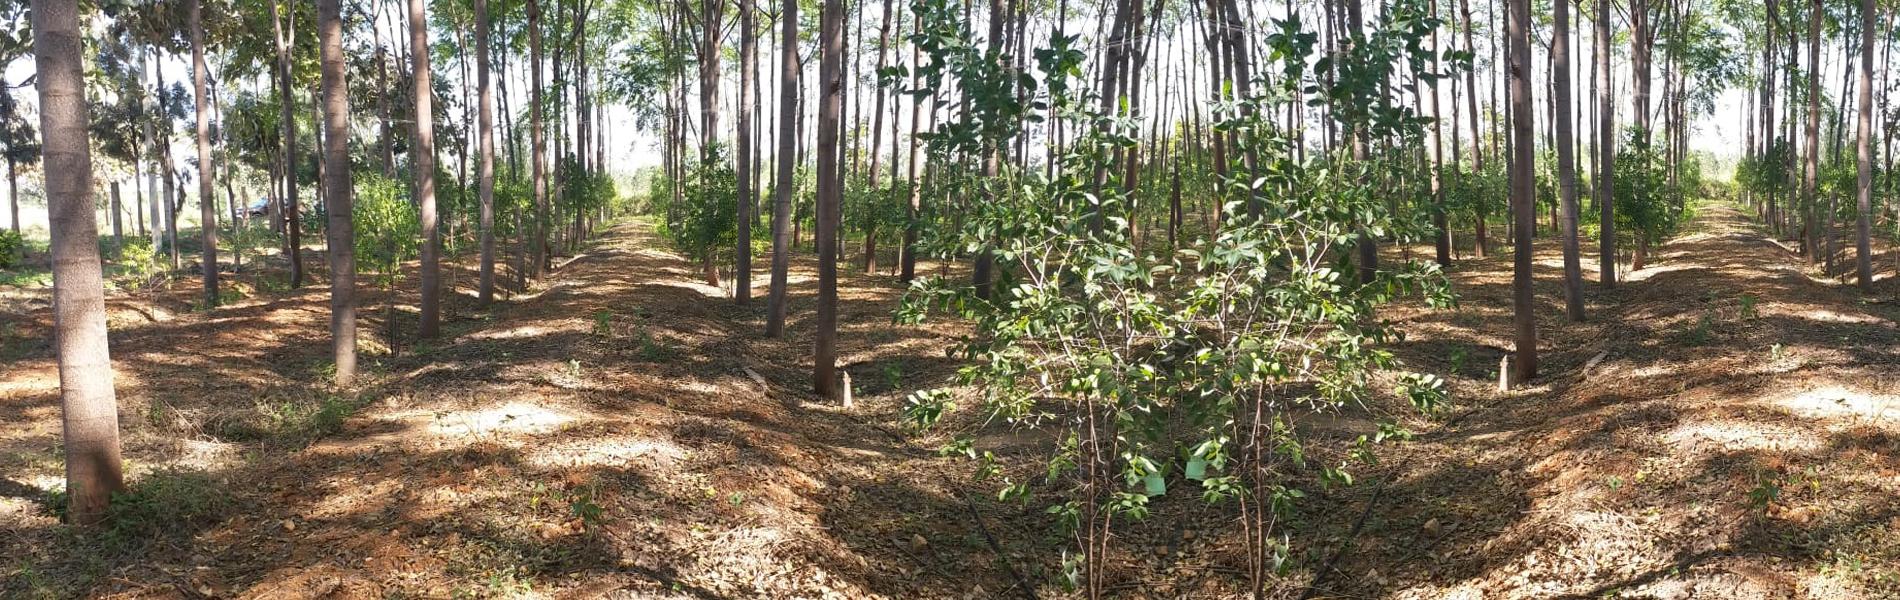 Vanasiri - Agro Forestry Consultancy